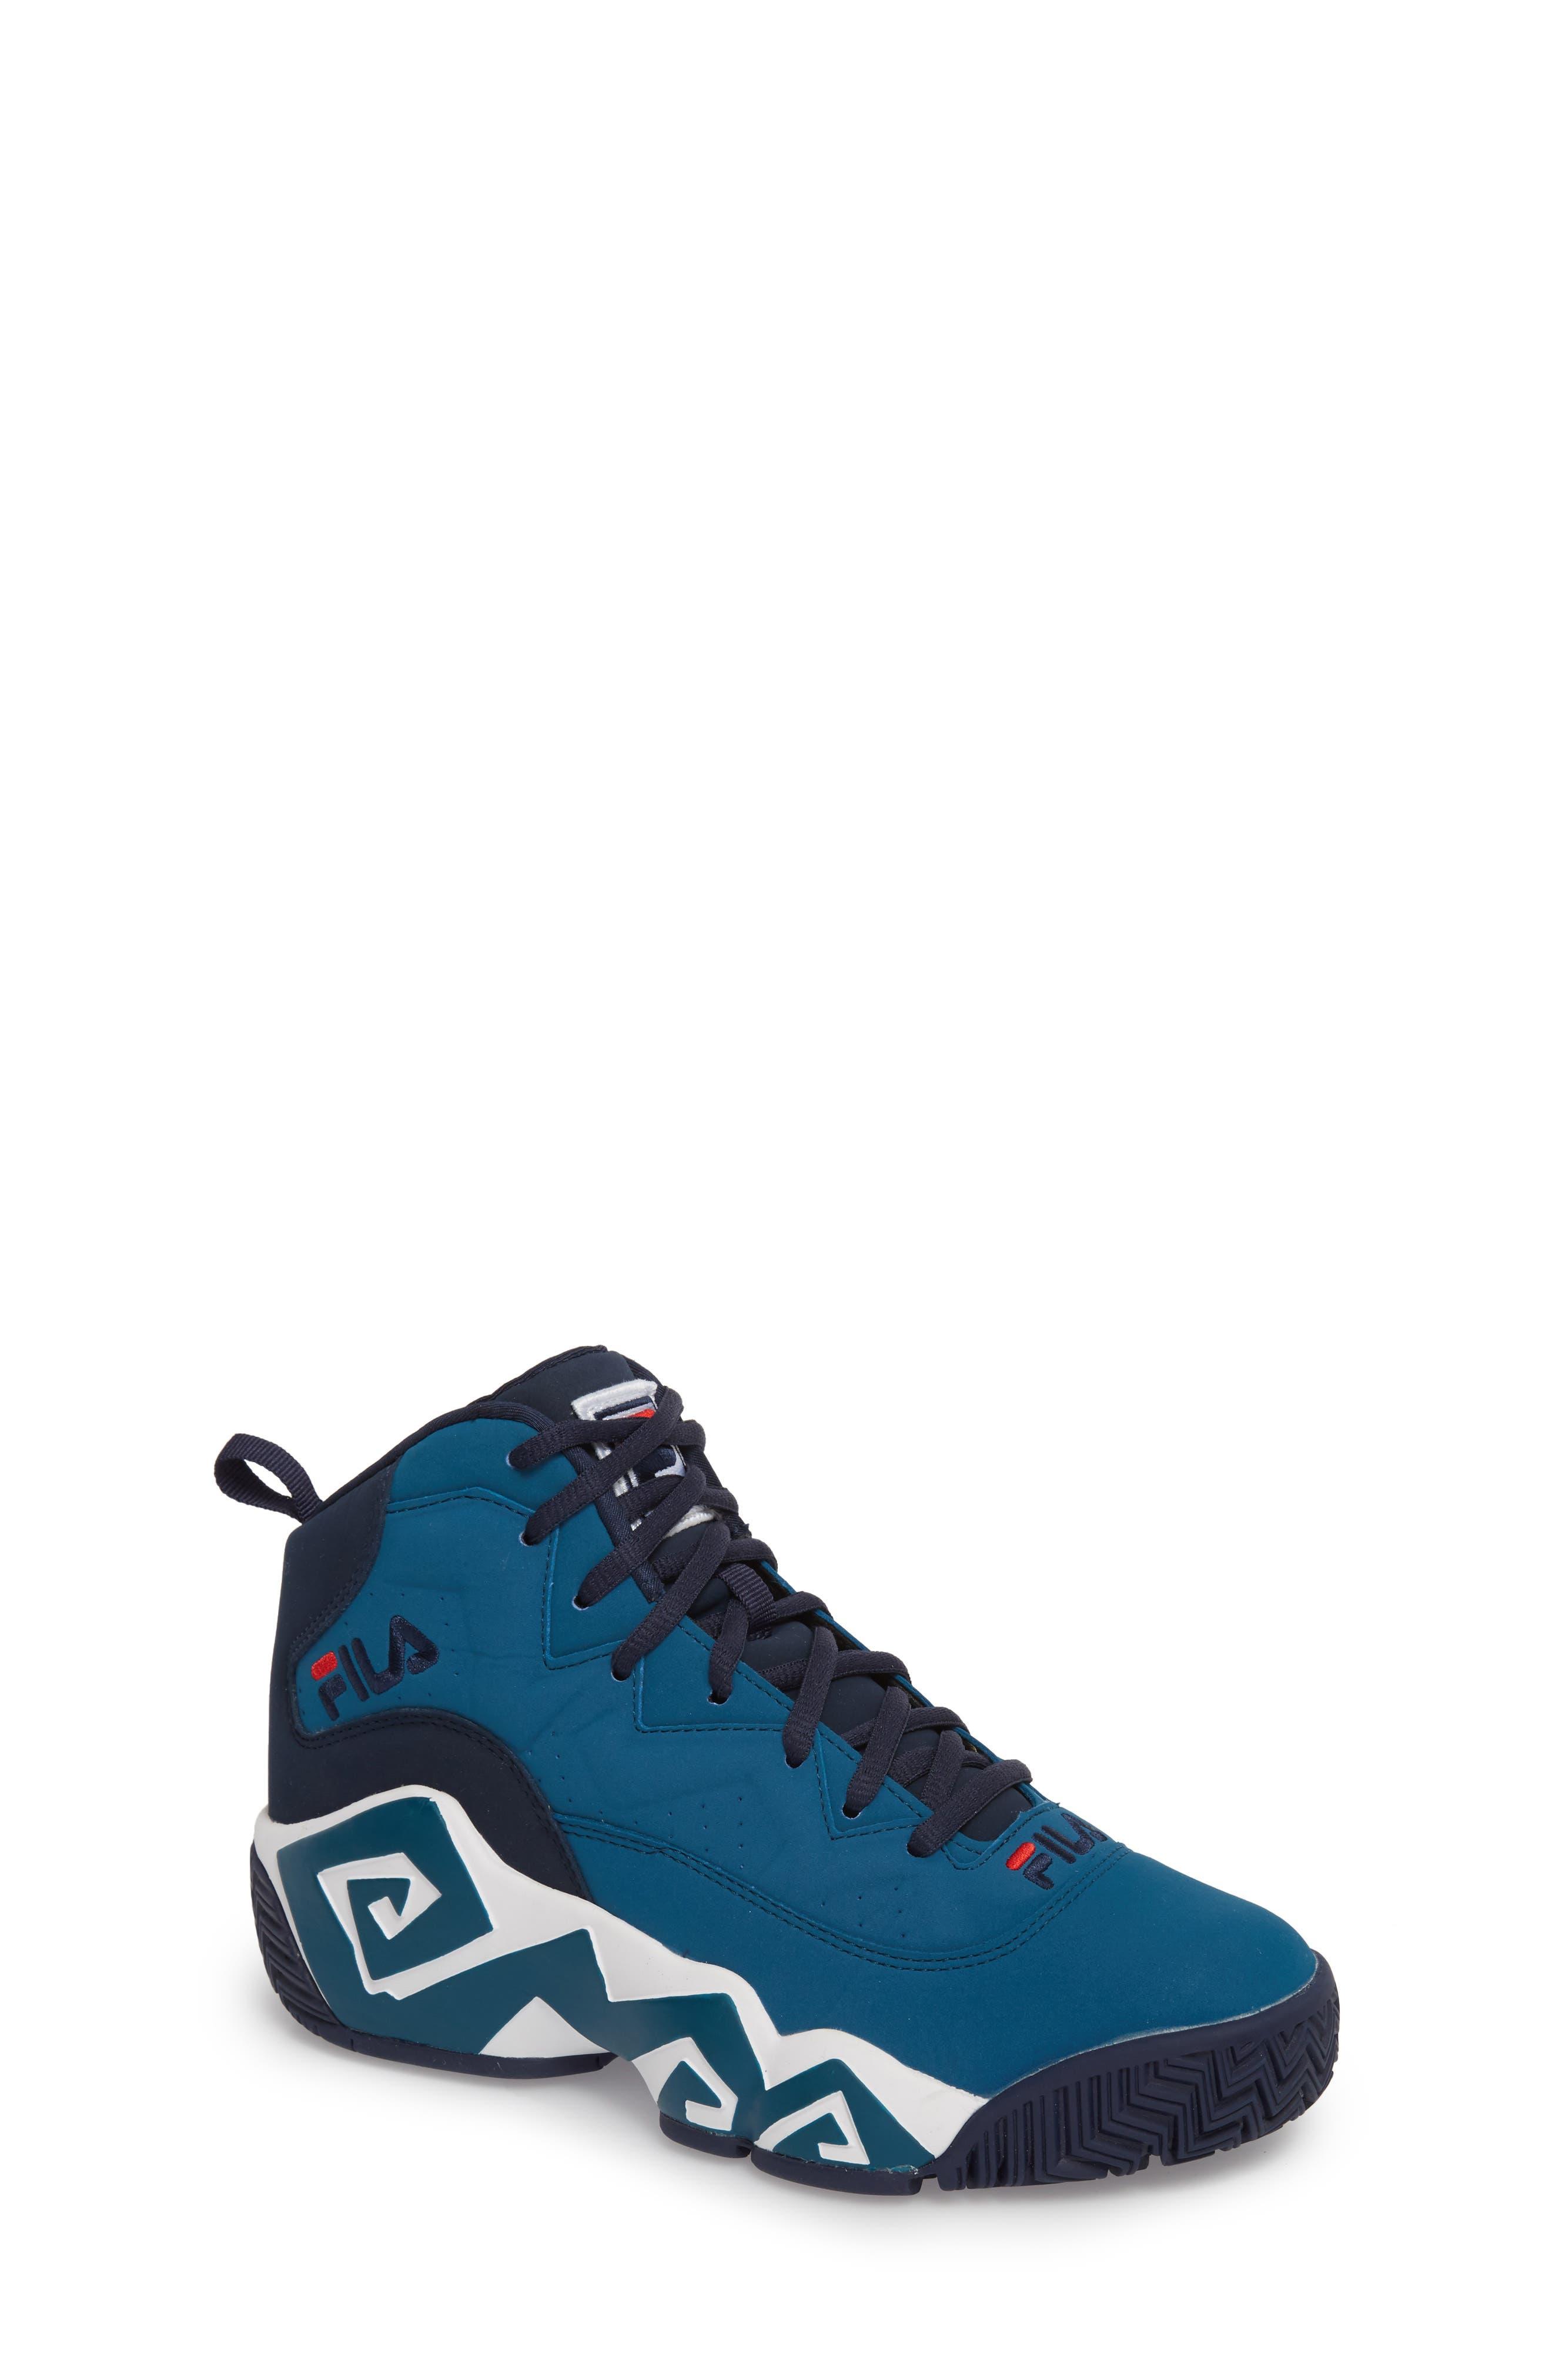 MB High Top Sneaker,                             Main thumbnail 1, color,                             INK BLUE/ FILA NAVY